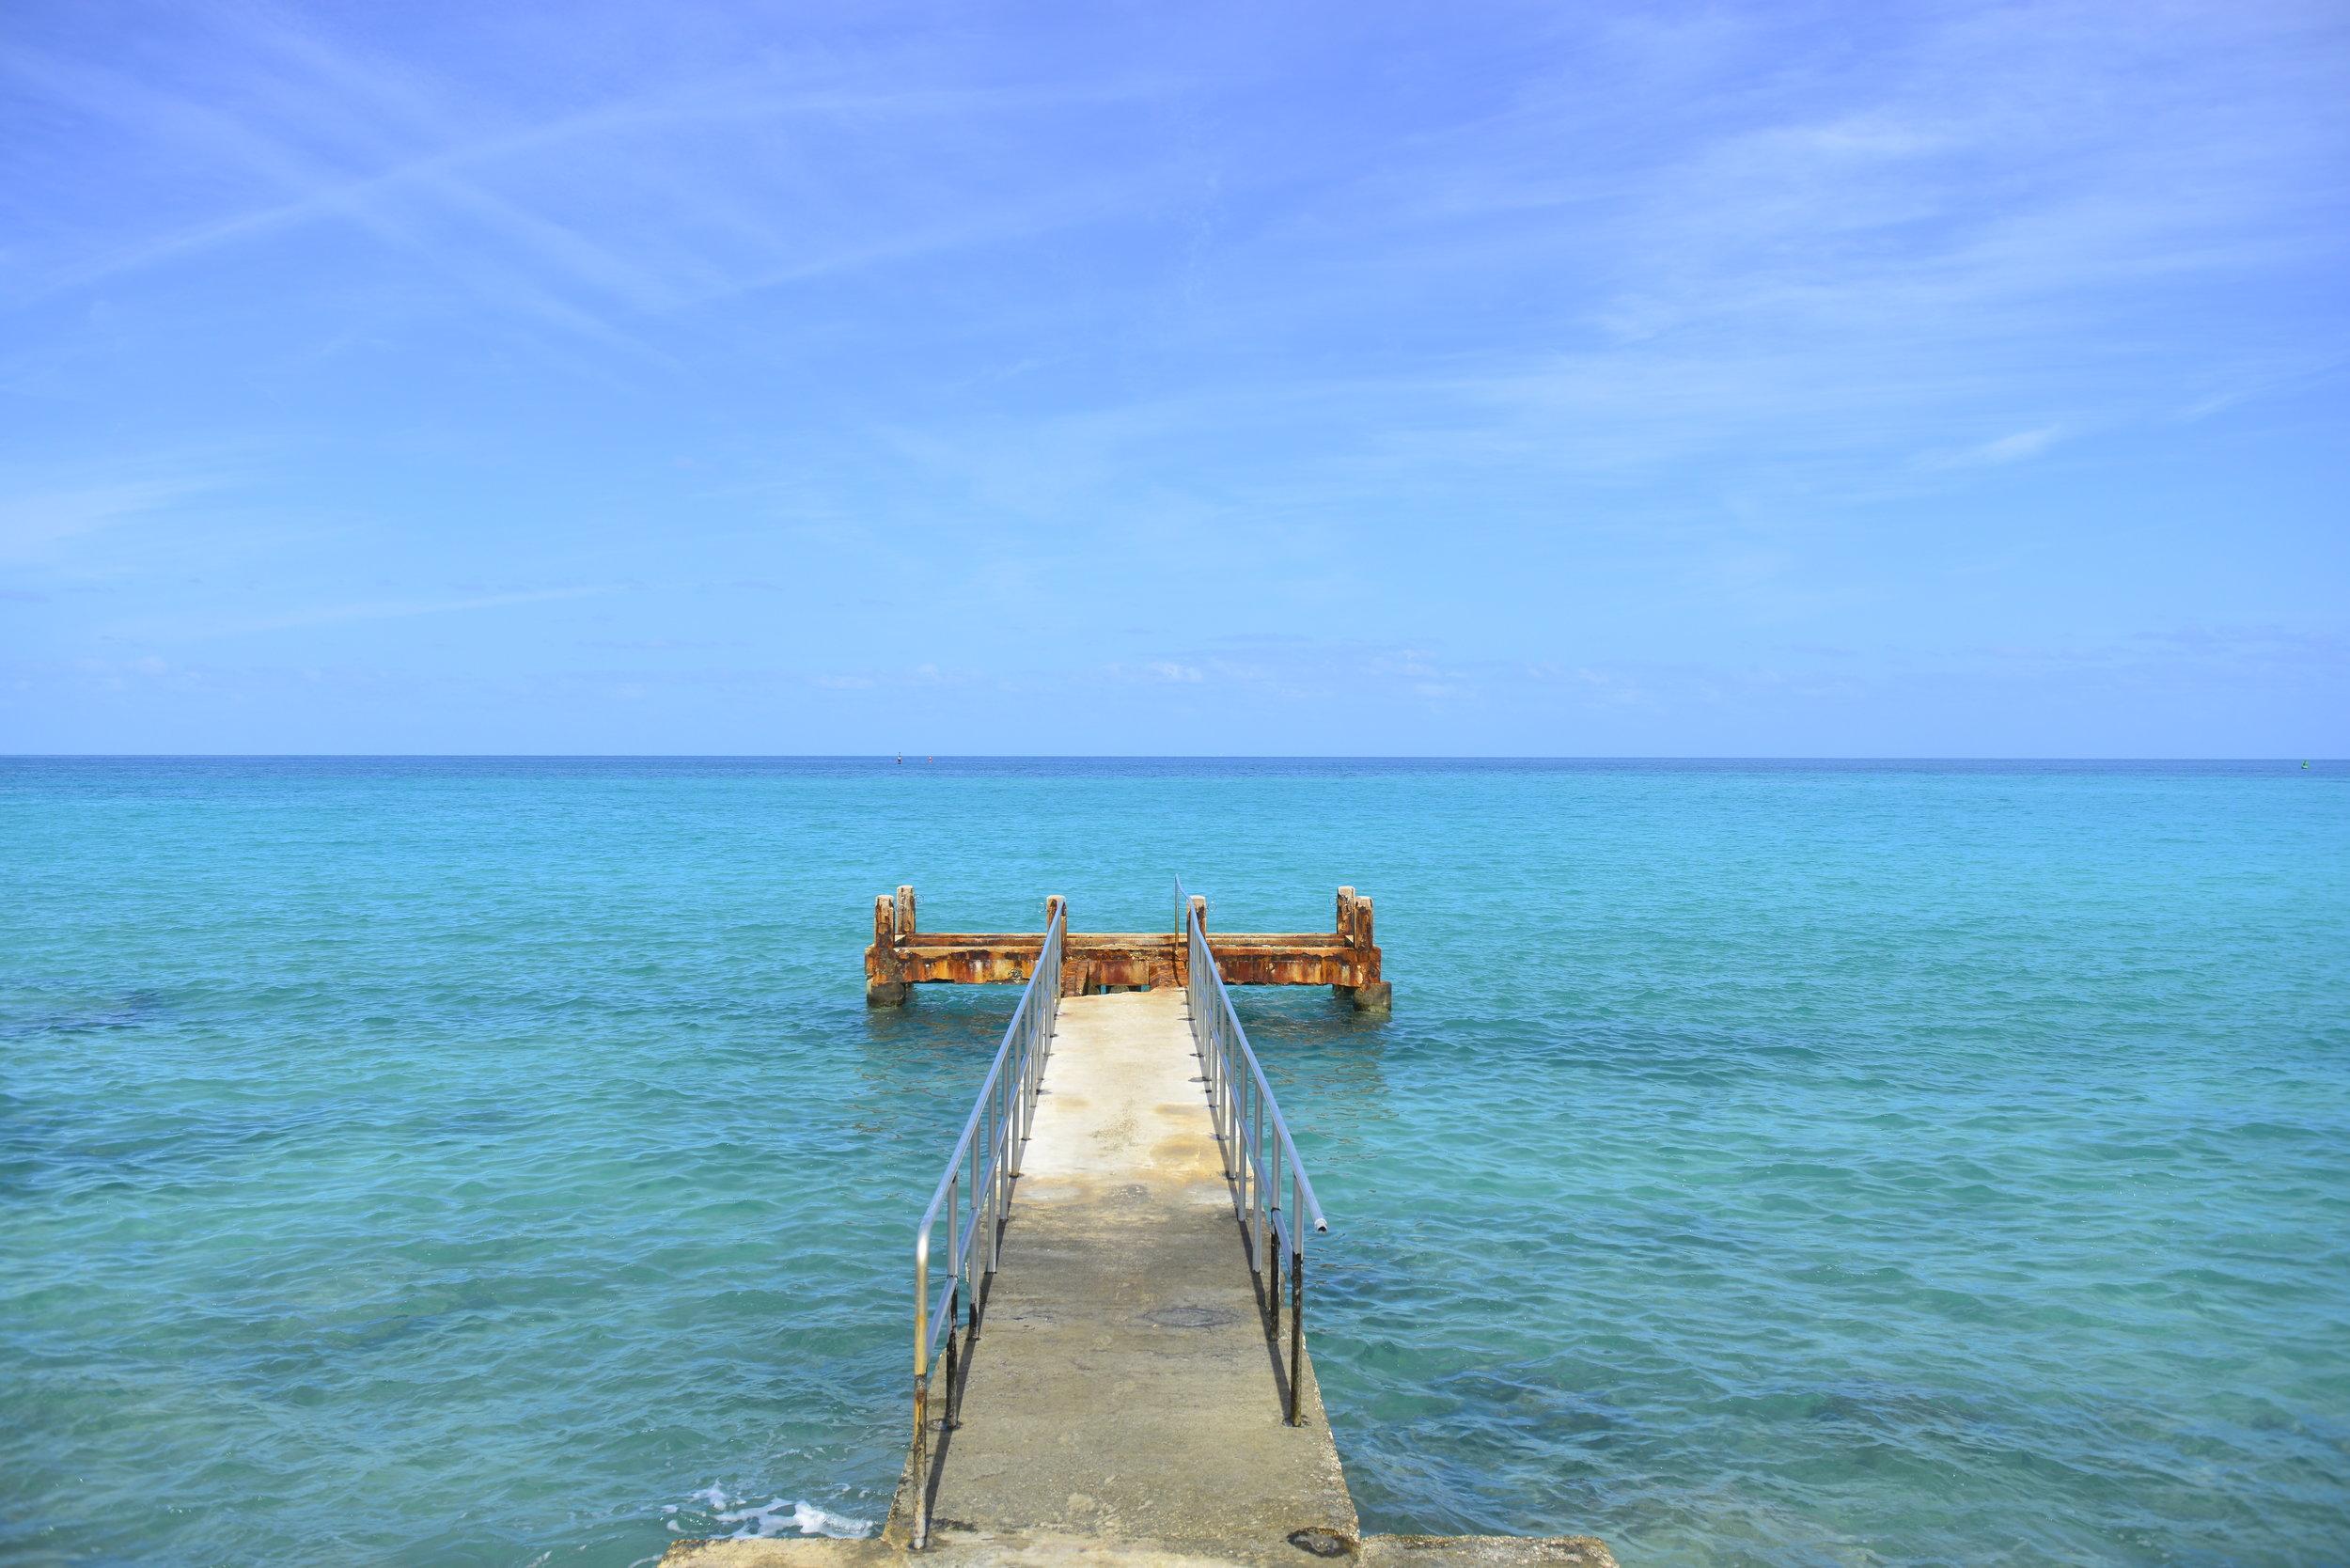 Near Fort St. Catherine - Bermuda - Dana Chirps